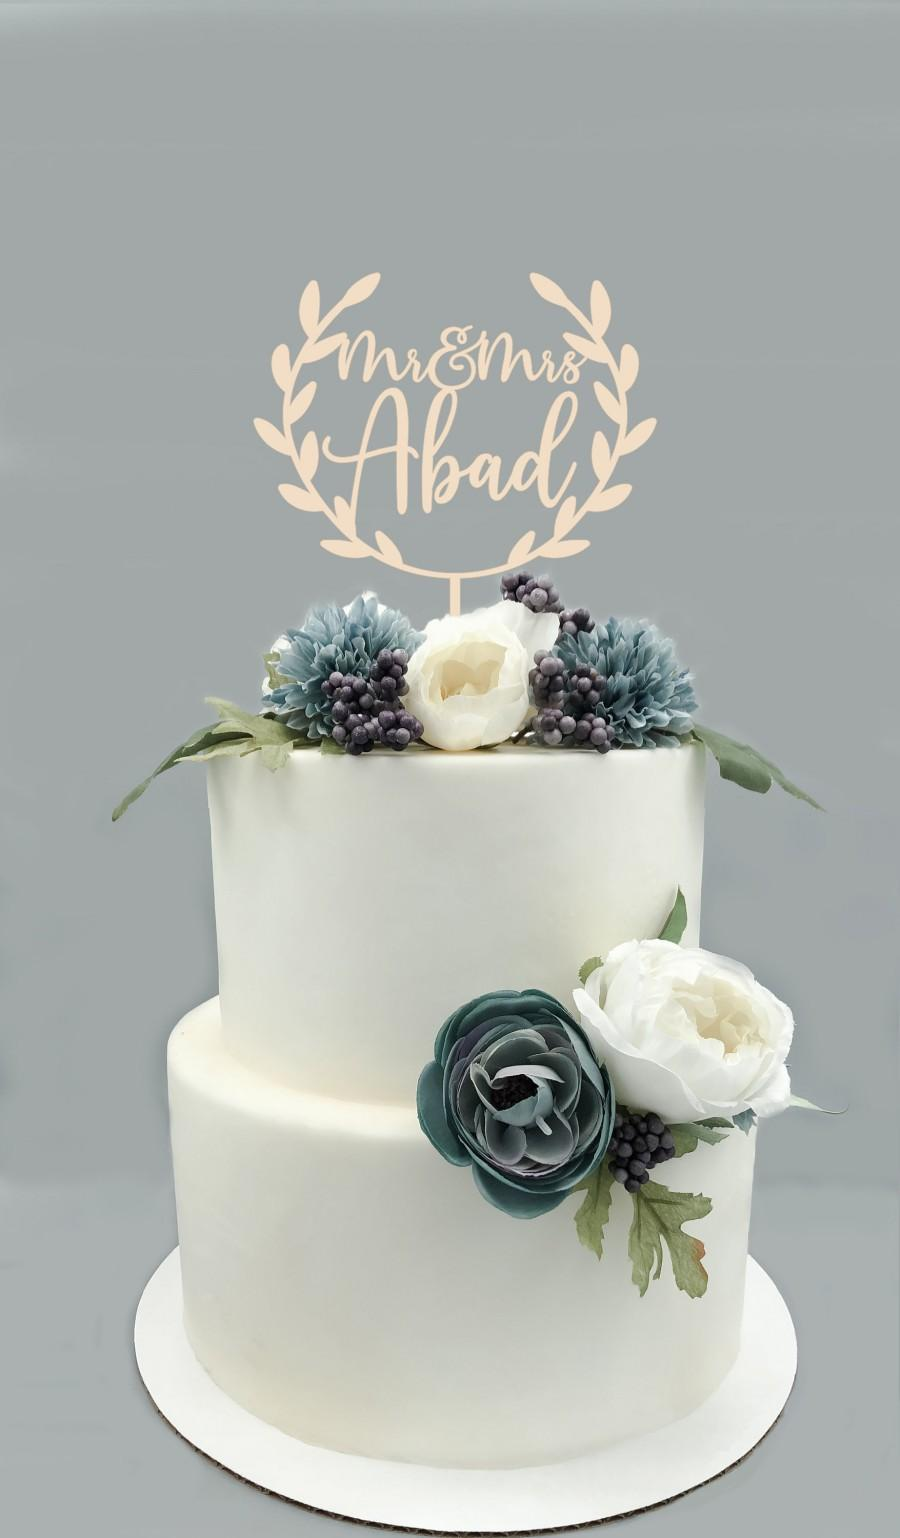 Mariage - Personalized Mr & Mrs Wood Wreath Cake Topper -Custom Mr Mr last name Wedding Cake Topper, Rustic Wedding Decor, Cake Decor, Engagement Cake